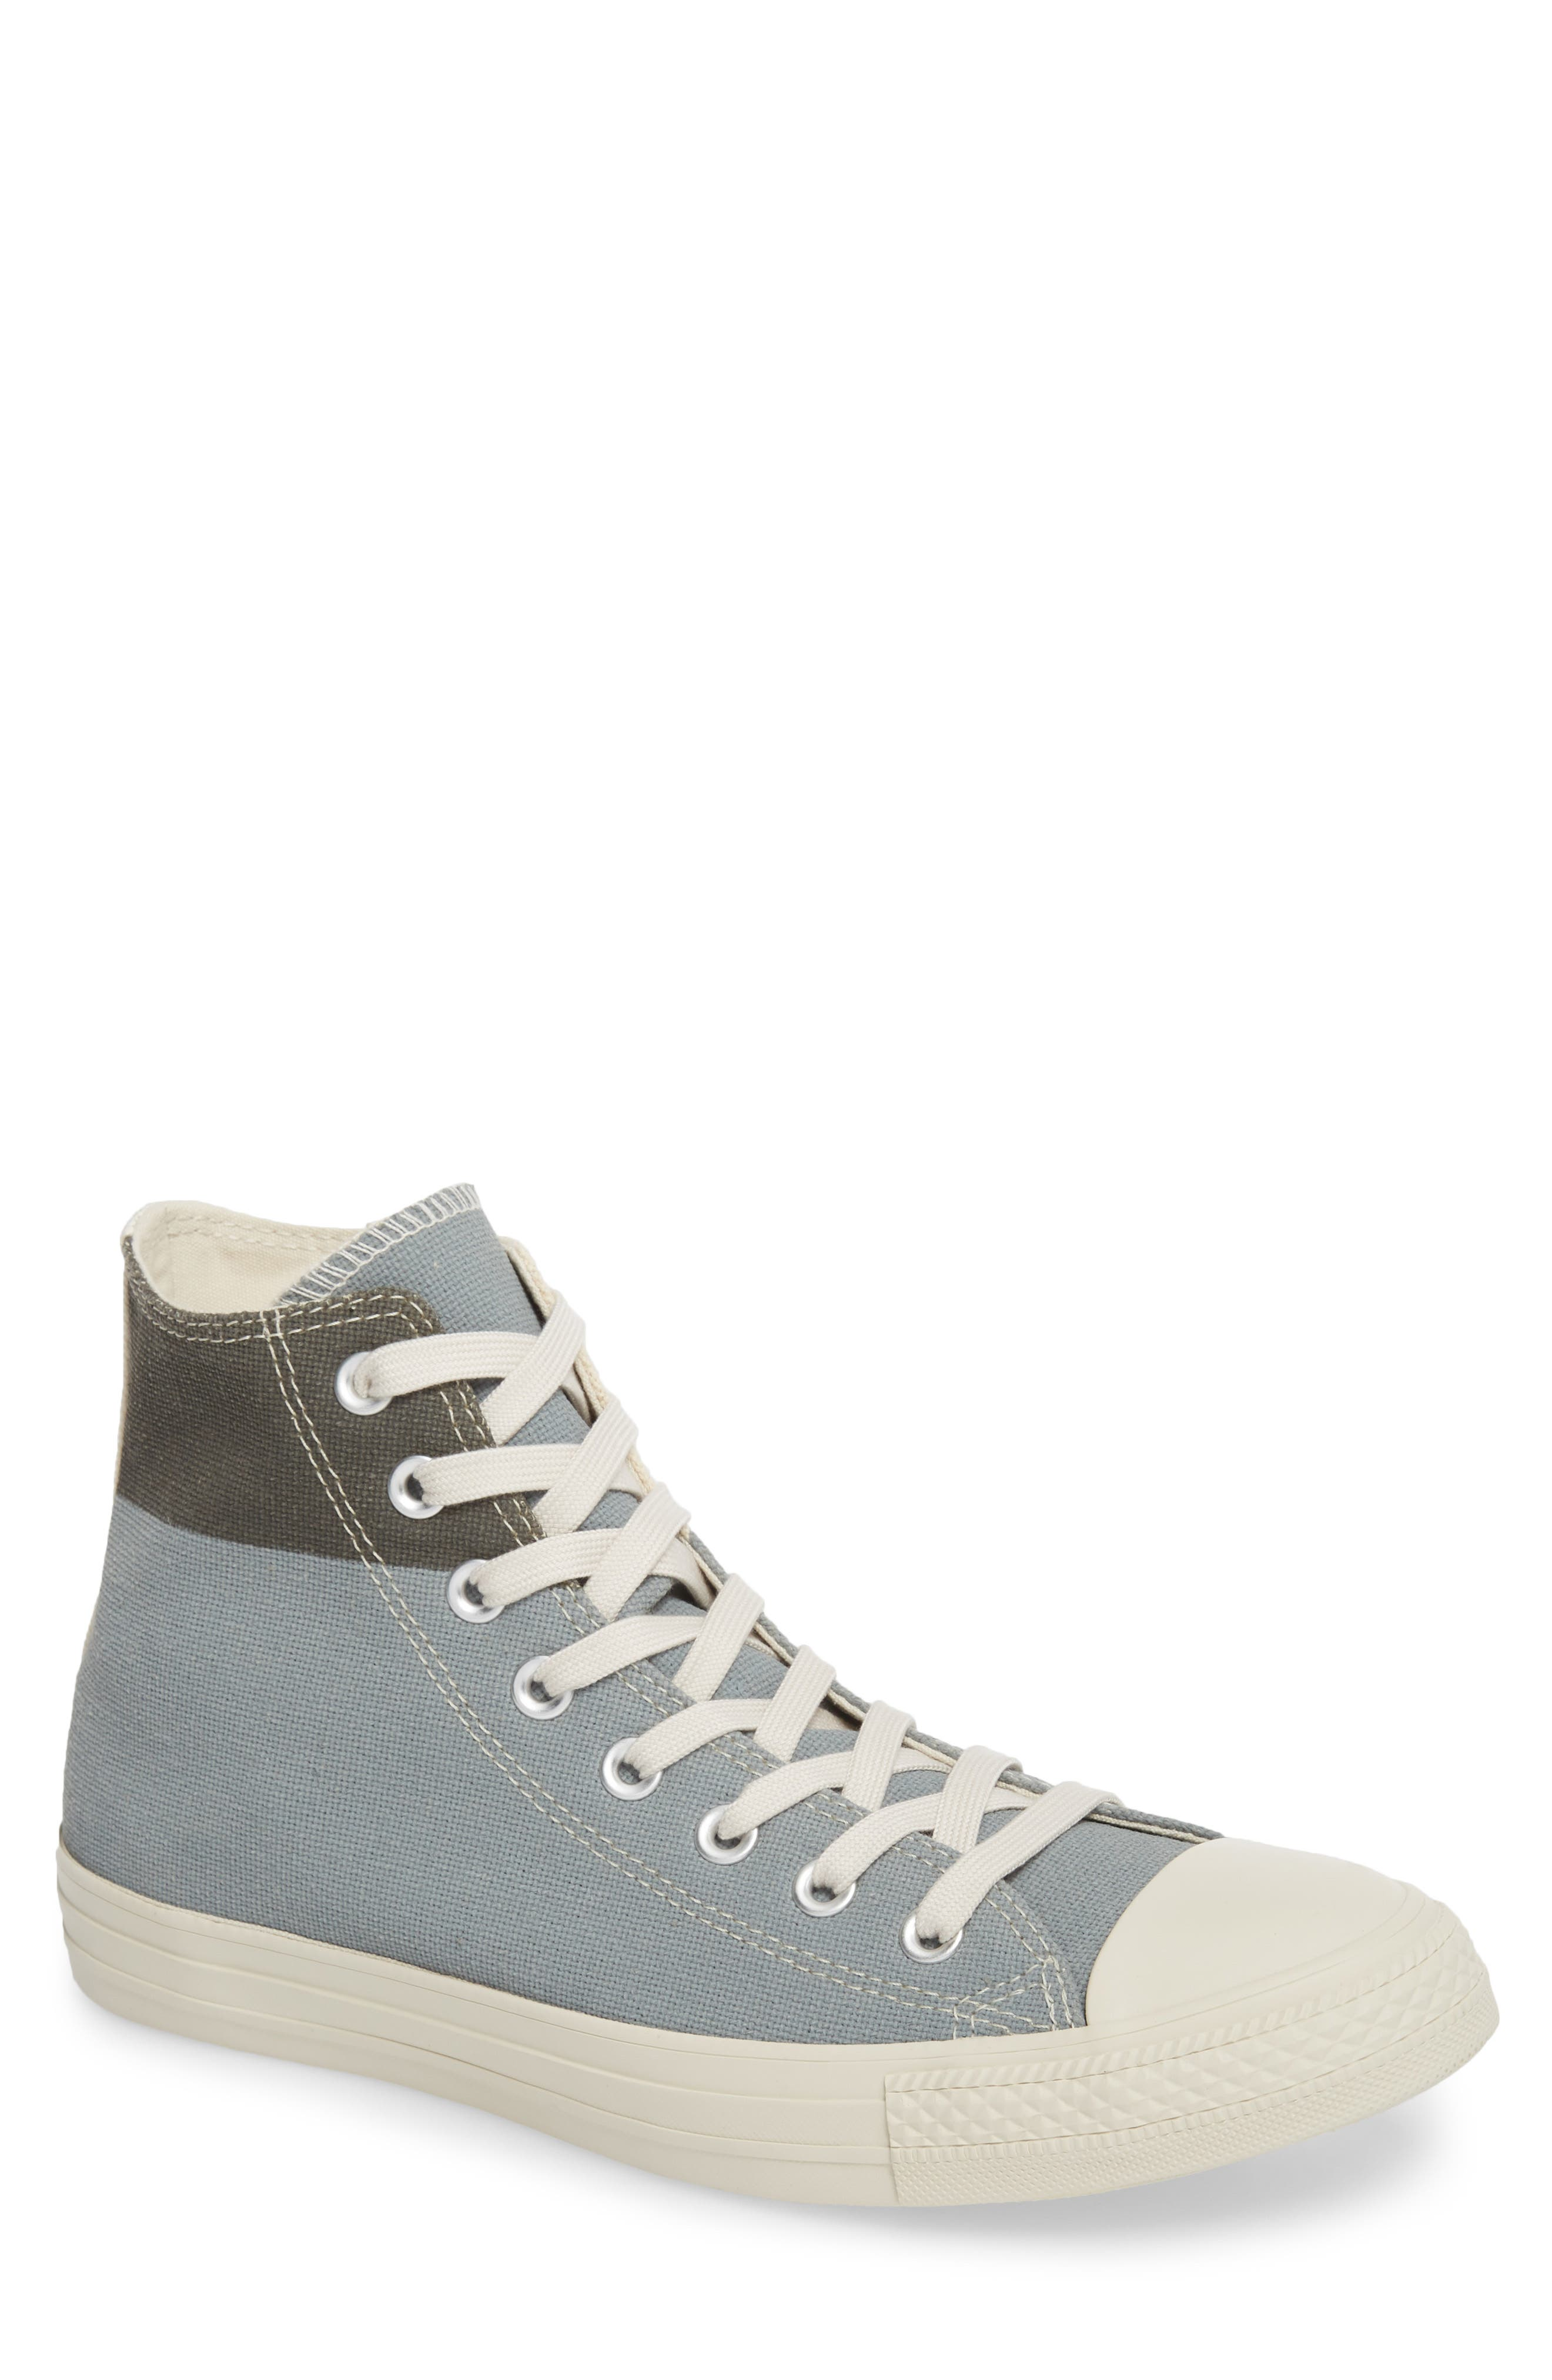 Chuck Taylor<sup>®</sup> All Star<sup>®</sup> Jute Americana High Top Sneaker,                             Main thumbnail 1, color,